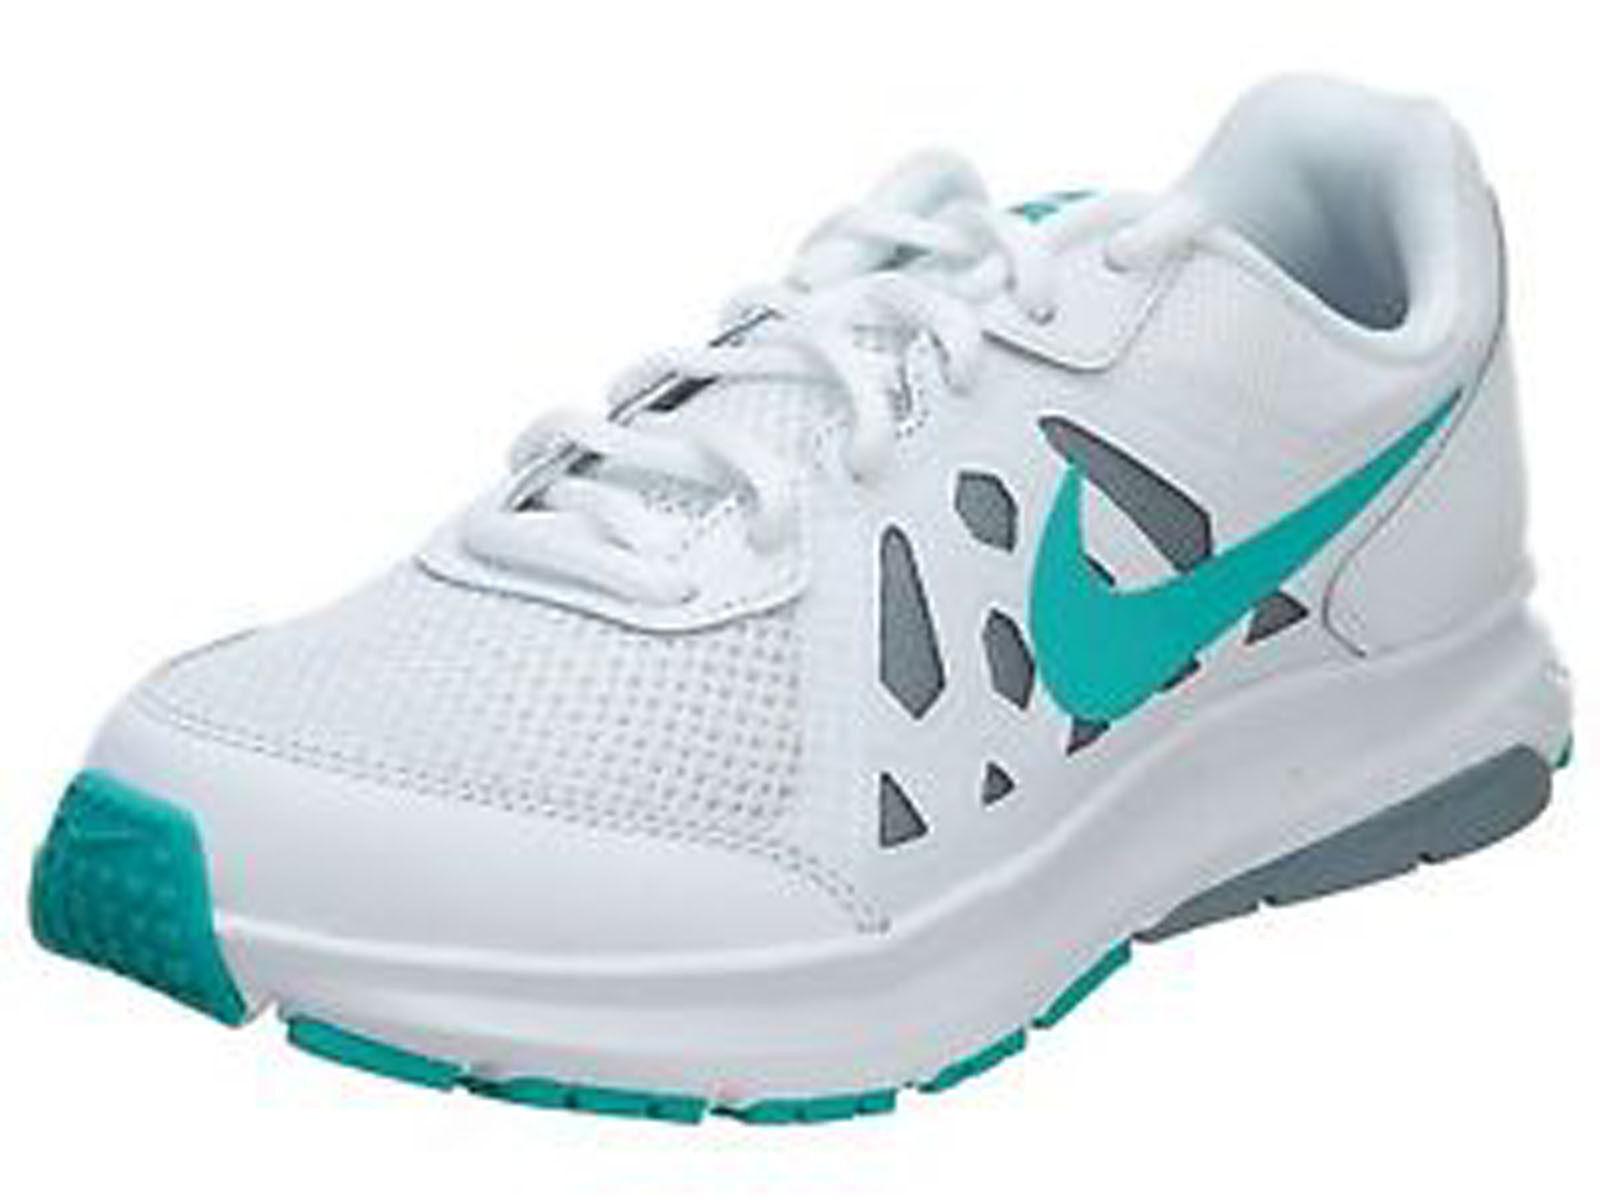 New New Nike  724477-100 Women's Dart 11 Running size Shoes size Running 7.5 5ead6c